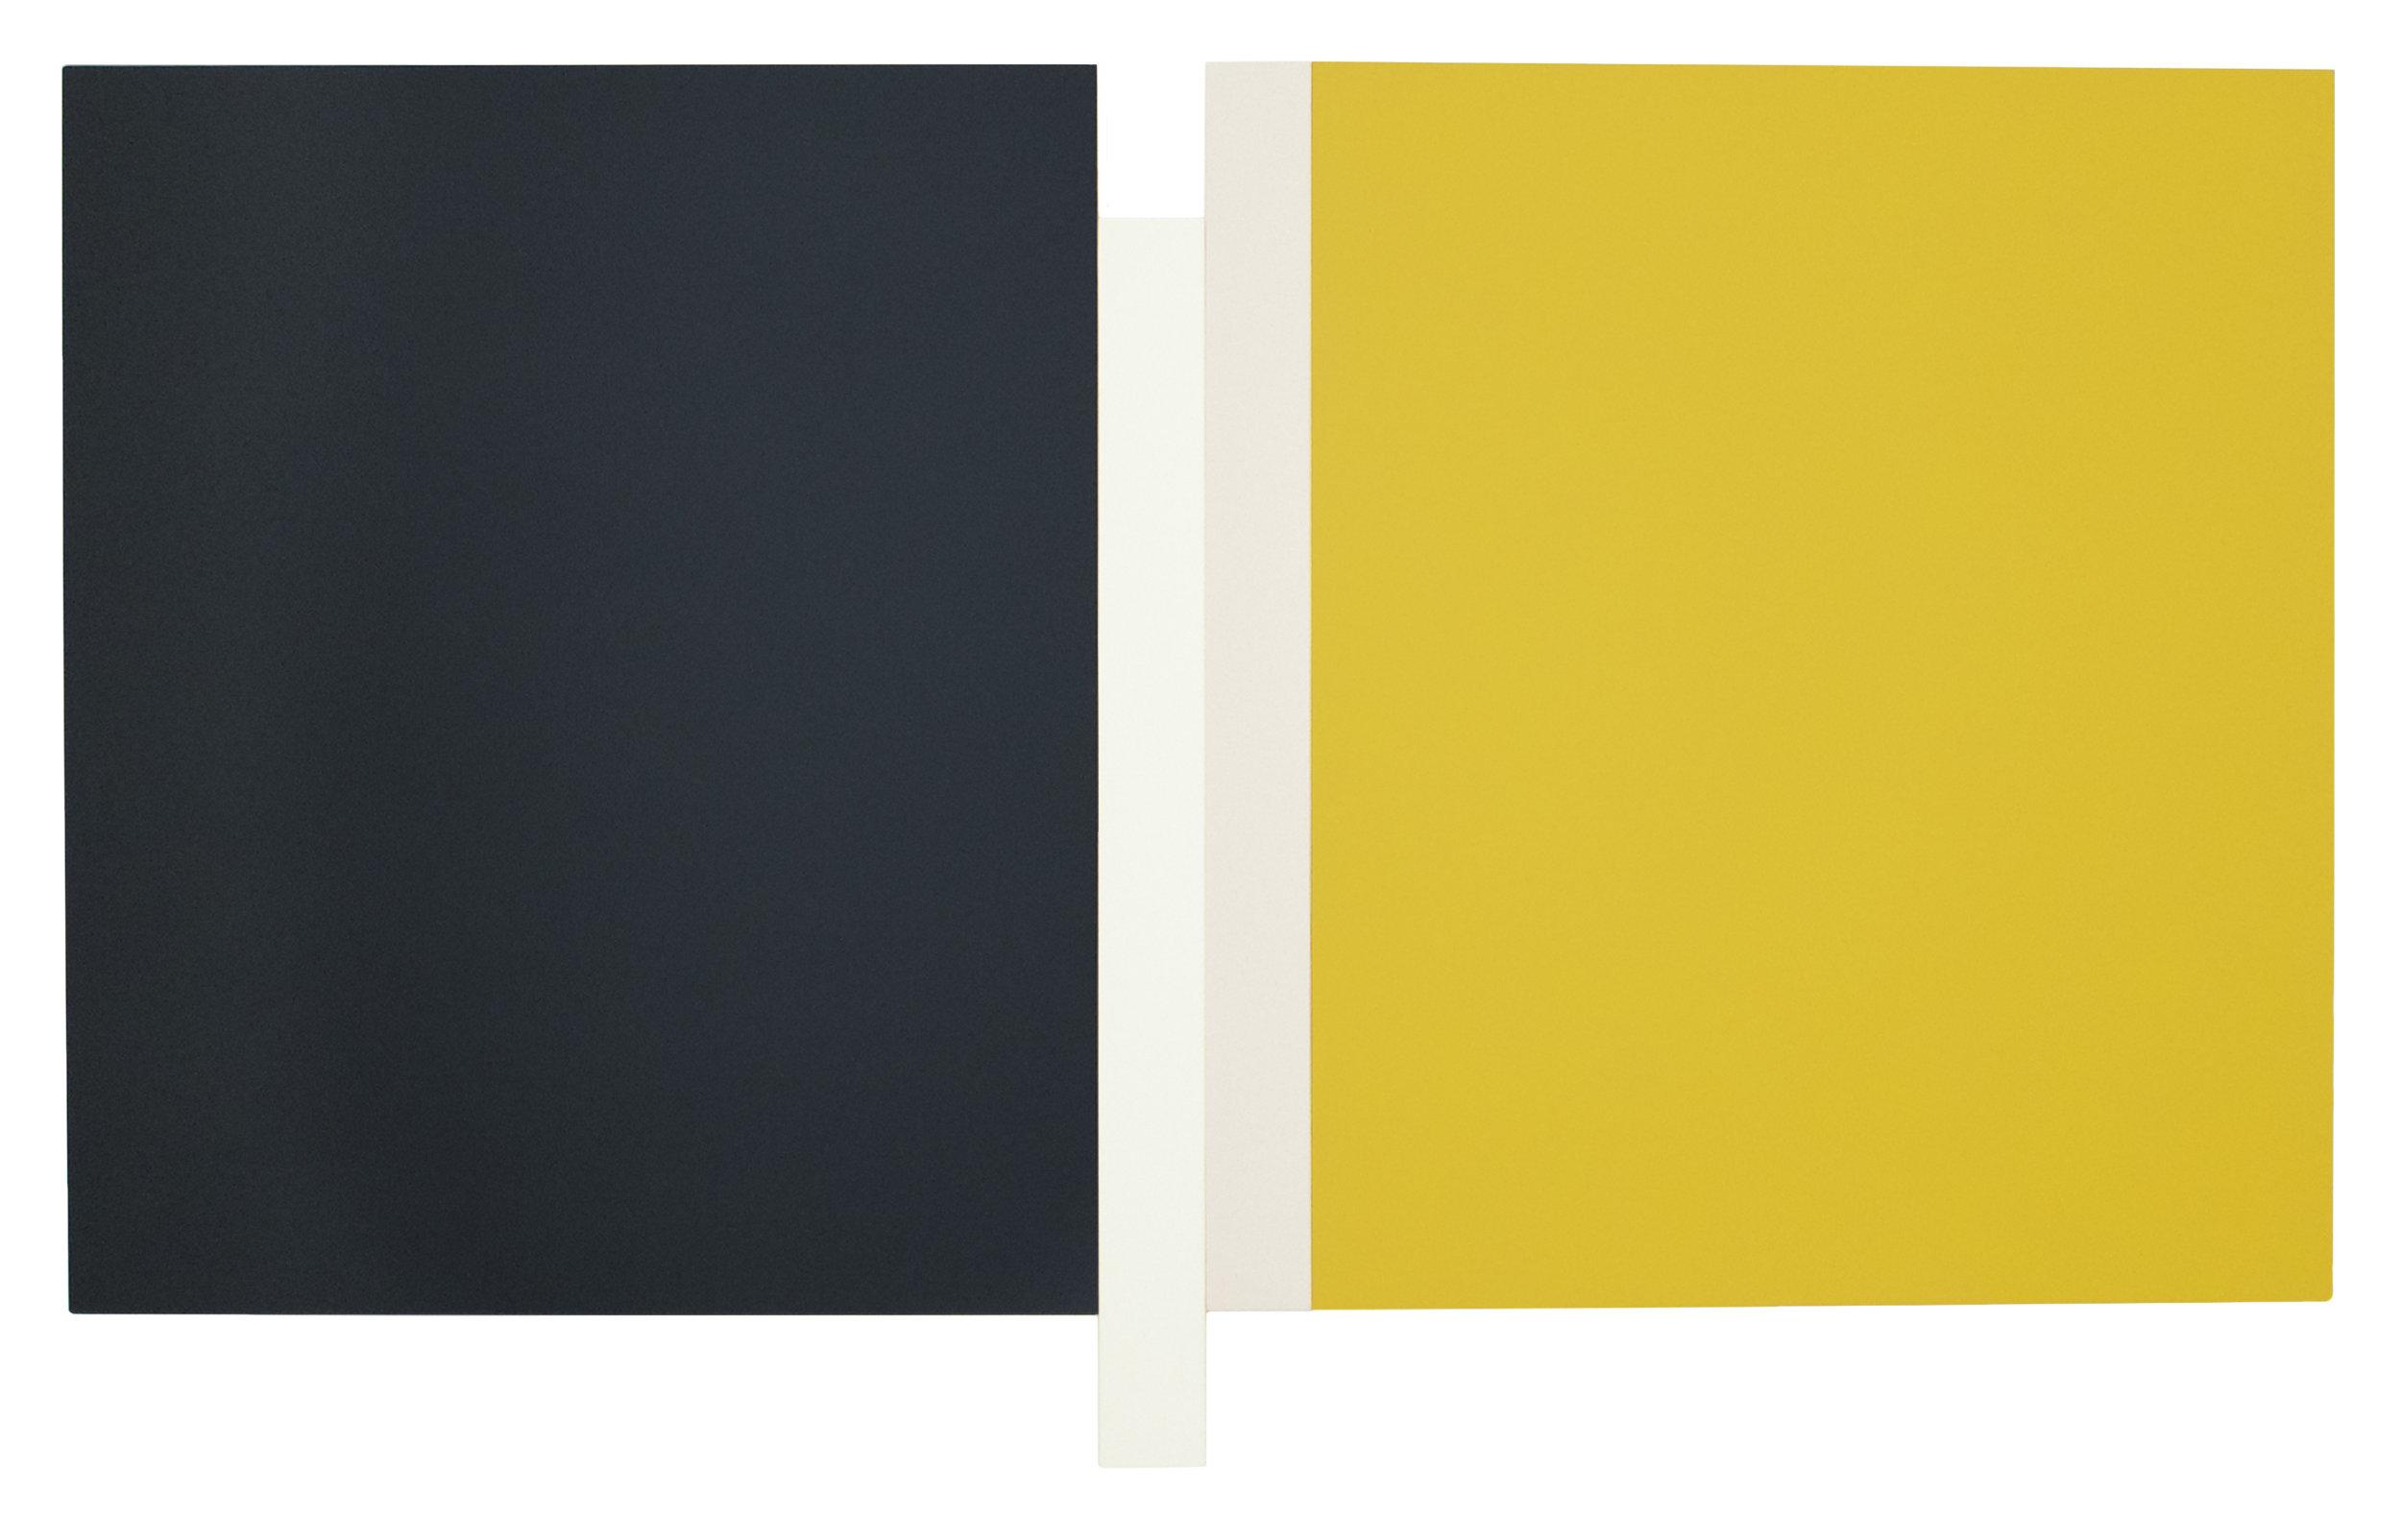 "SUNYATA GRAY, WHITE,CANVAS, YELLOW Acrylic on canvas   54 x 88.5""   INQUIRE"